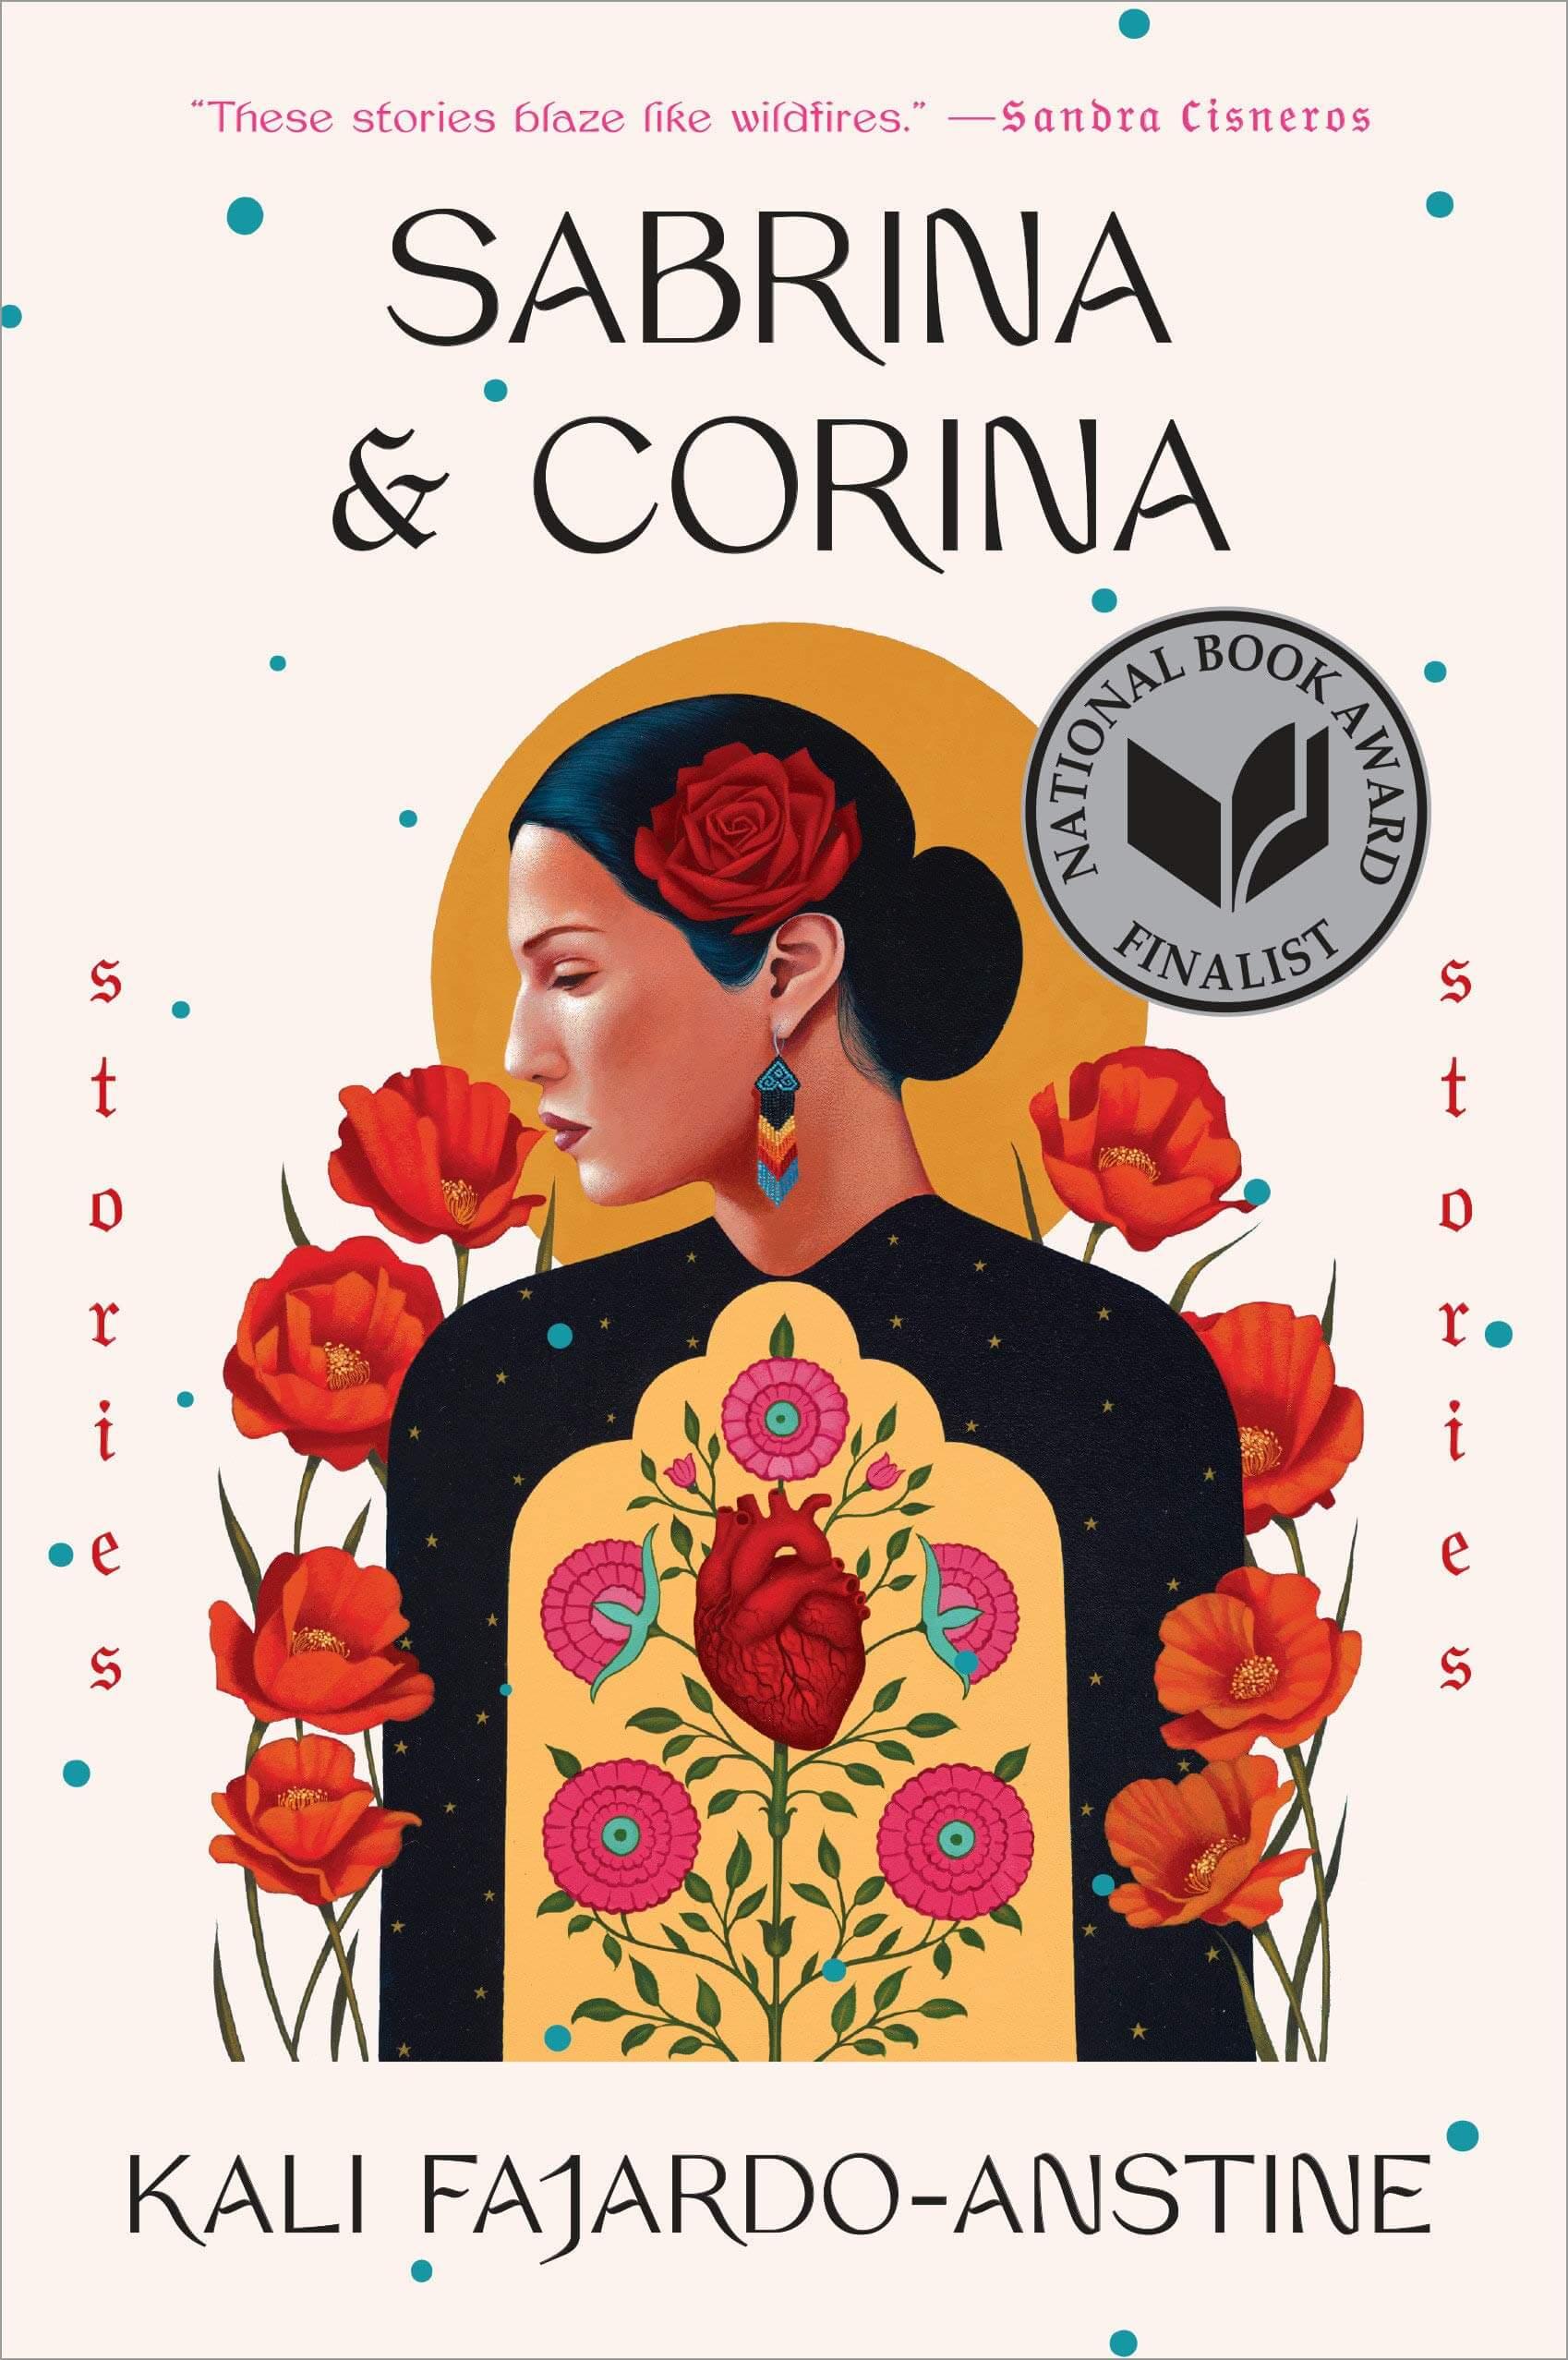 Sabrina & Corina book cover image